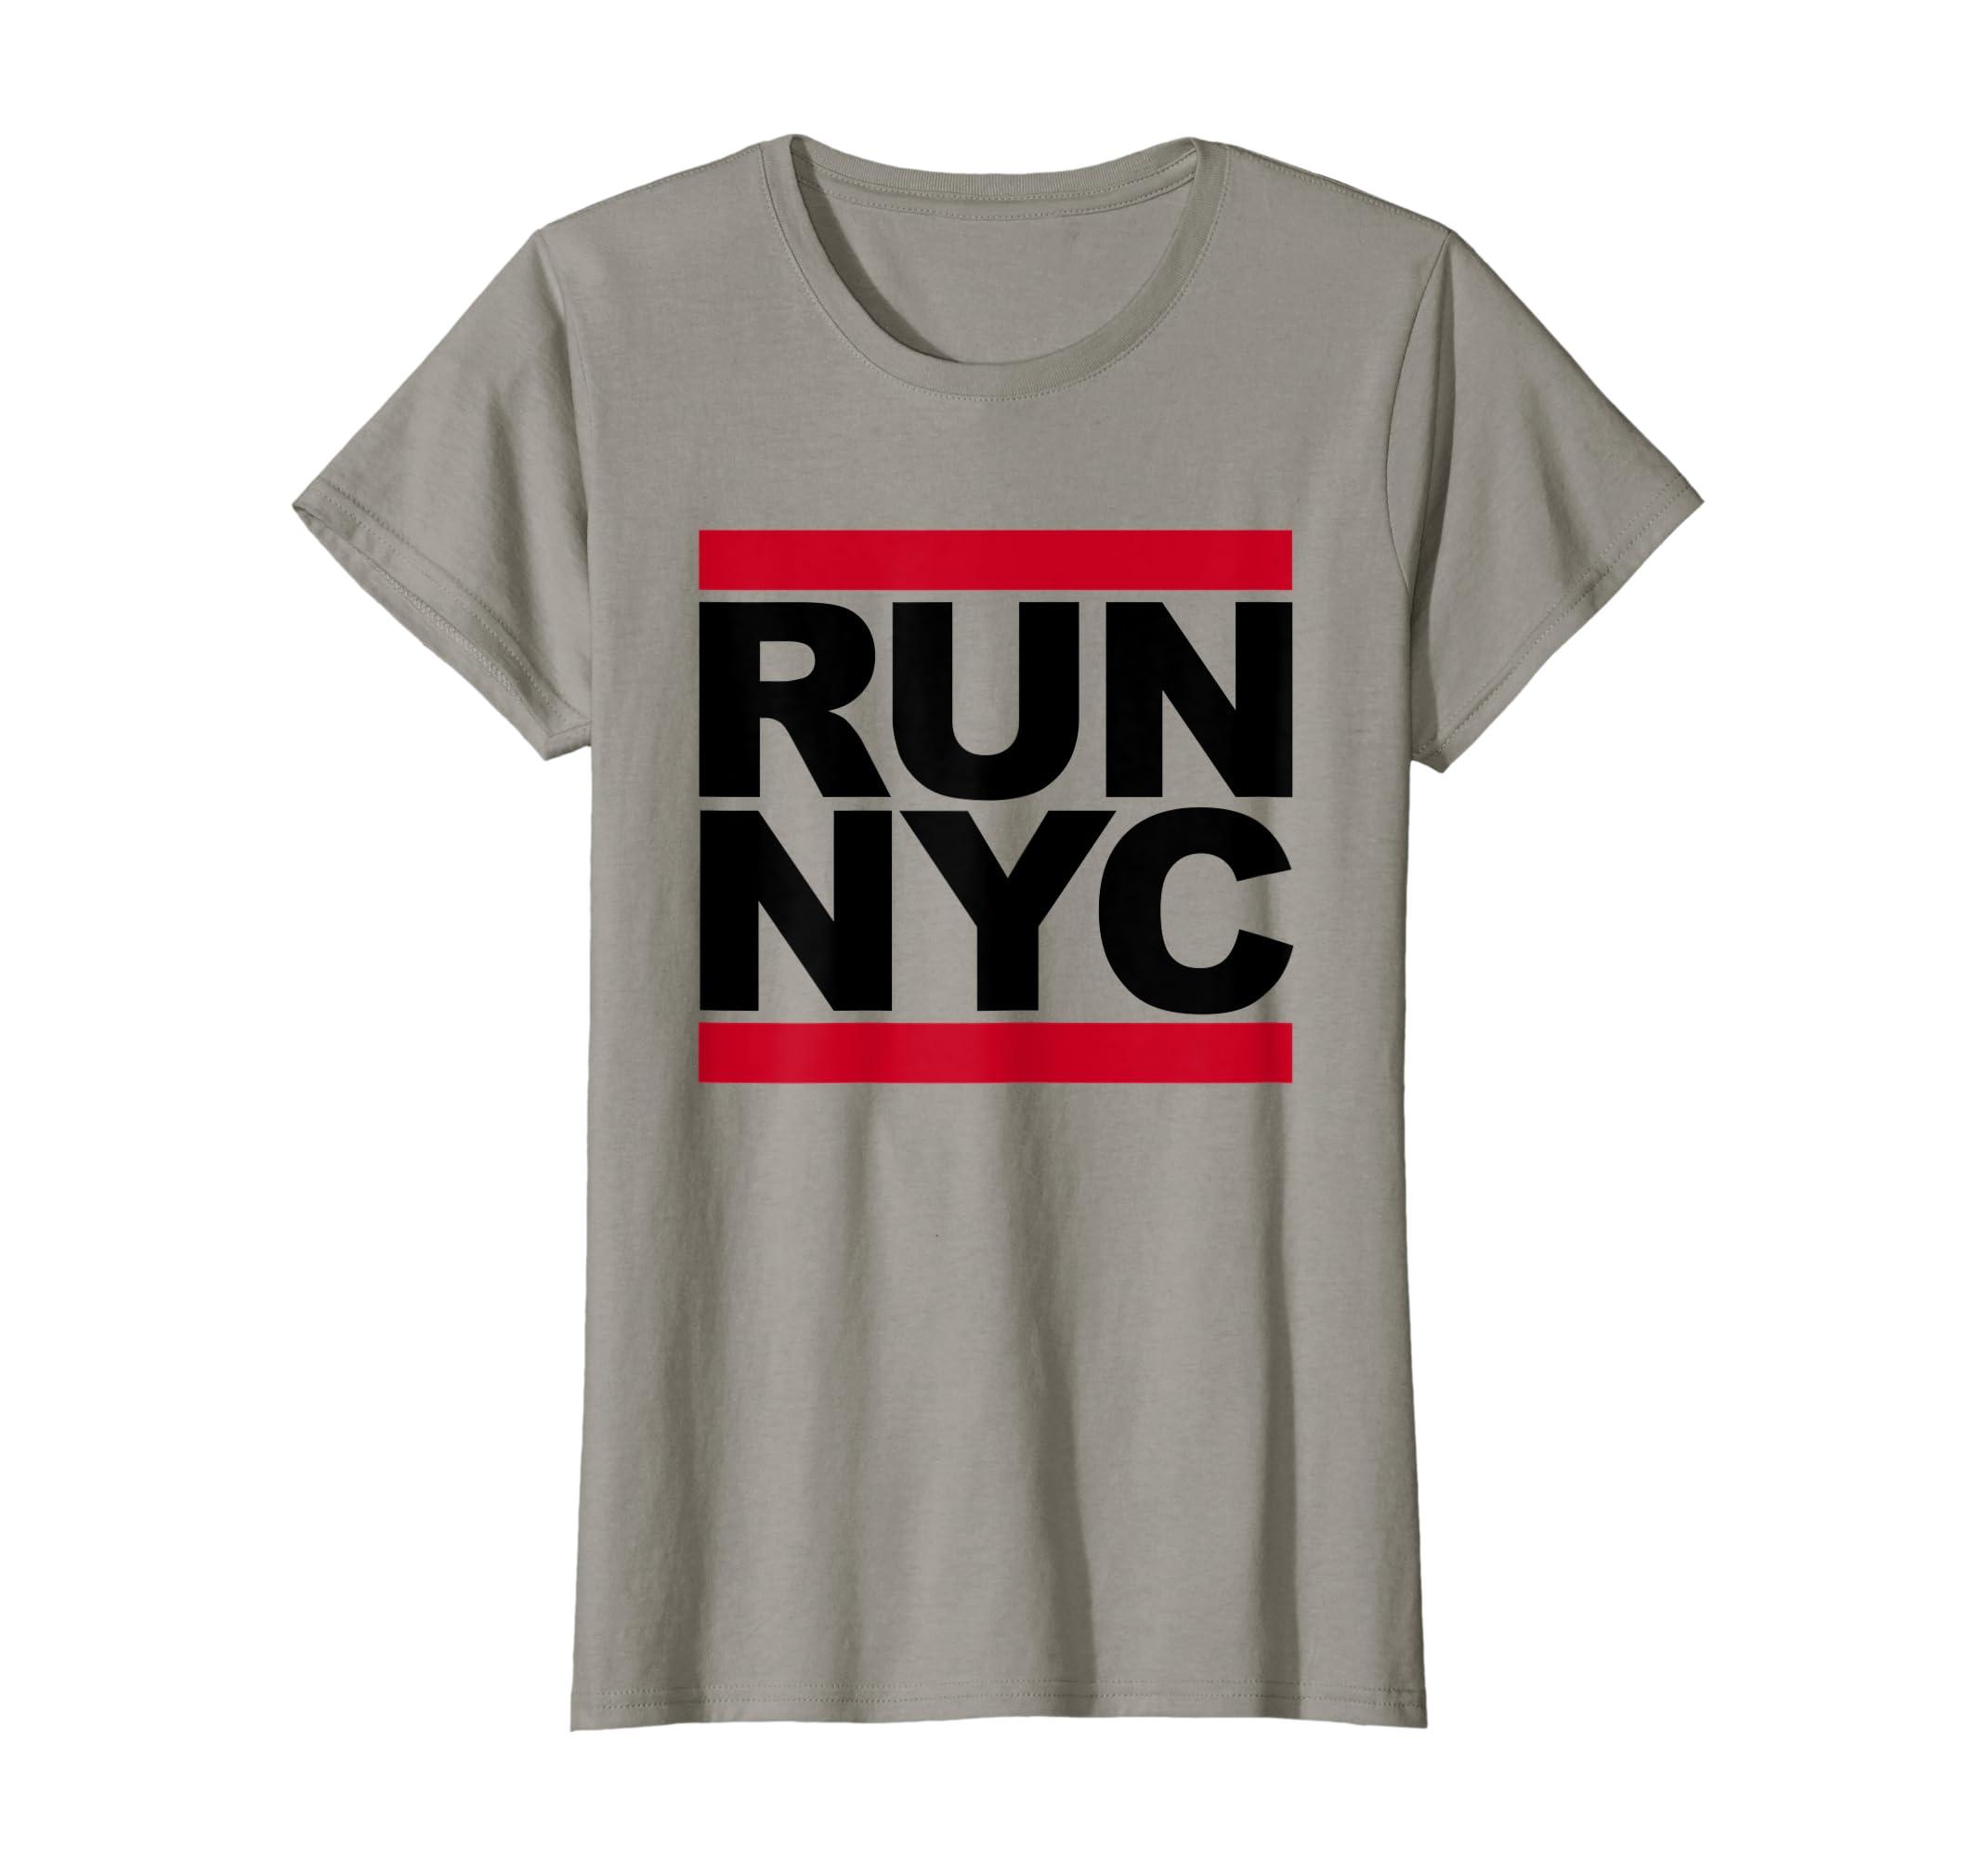 Amazon.com  Run NYC T-Shirt - New York City Running Shirt for Runners   Clothing 9bdd28c3547